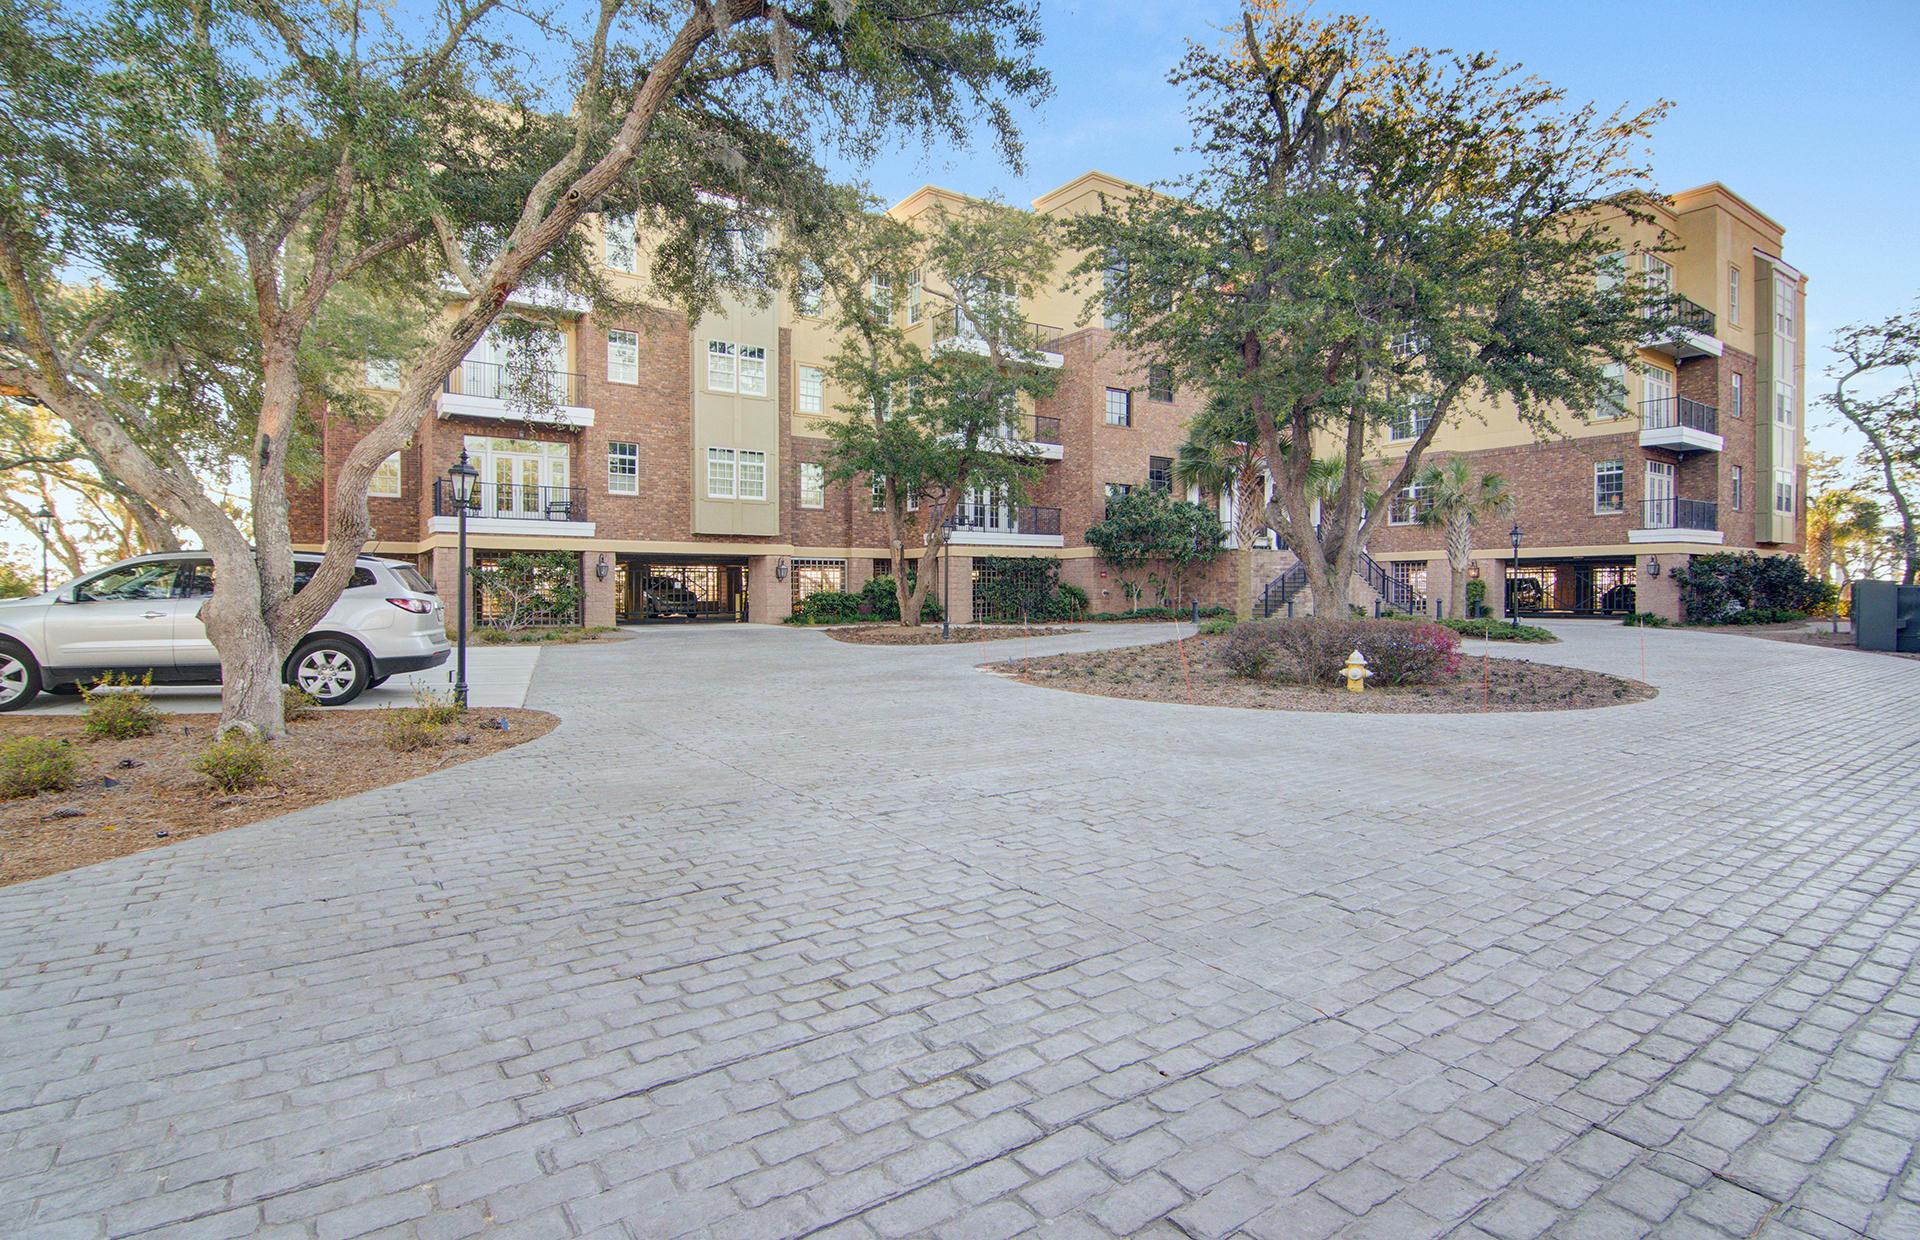 Daniel Island Homes For Sale - 134 Fairbanks Oak, Charleston, SC - 57